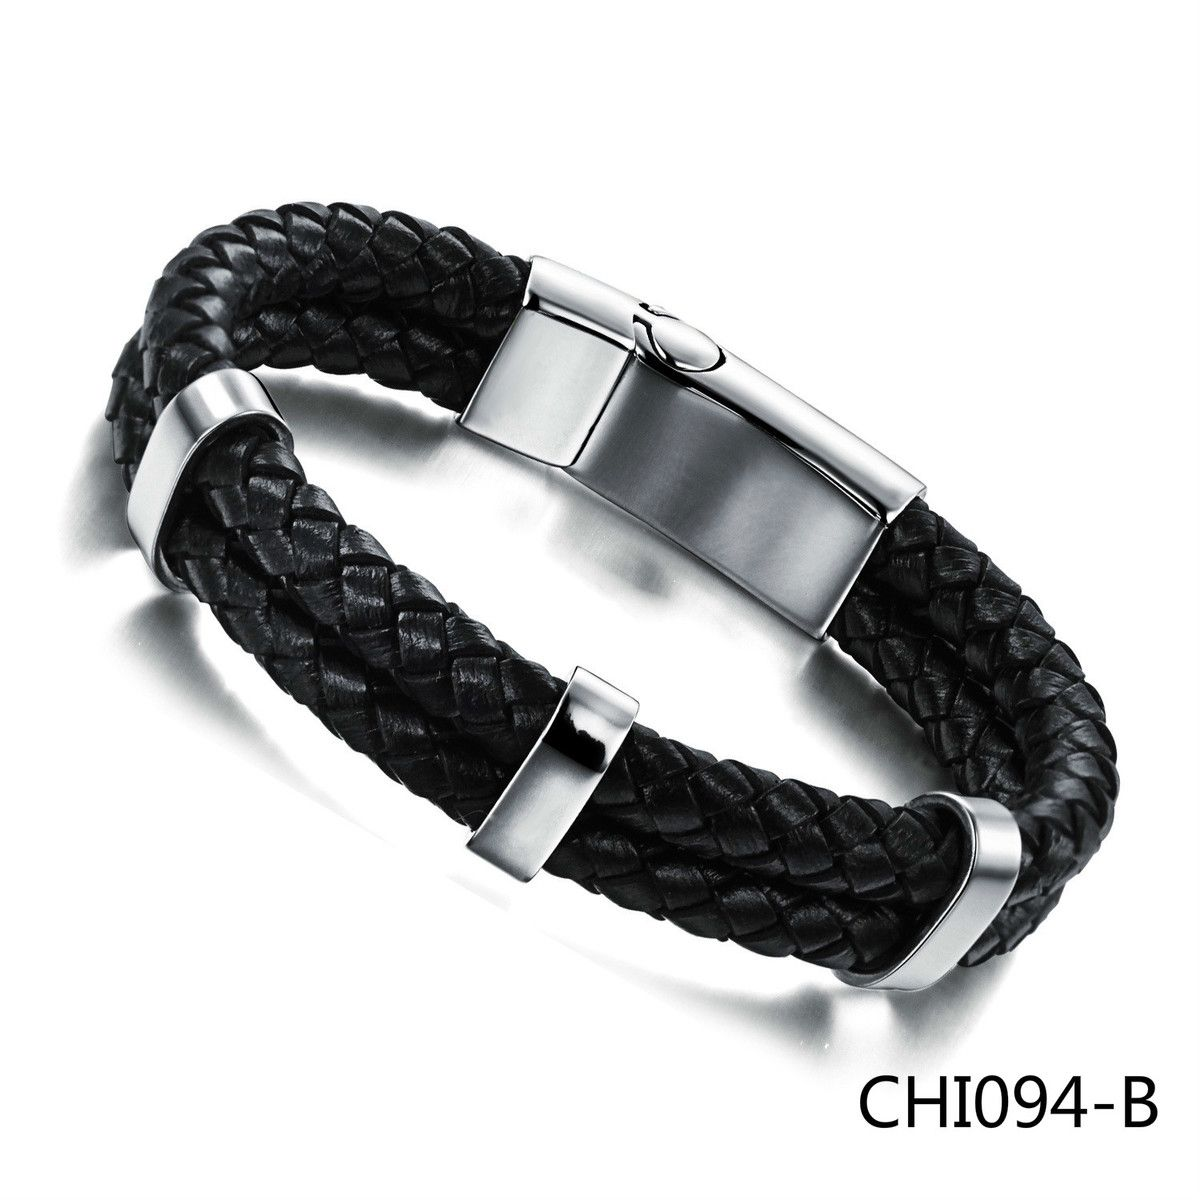 European Ornaments Man charms Bracelet Skin Tide Male Birthday Gift PH899 bracelets for women